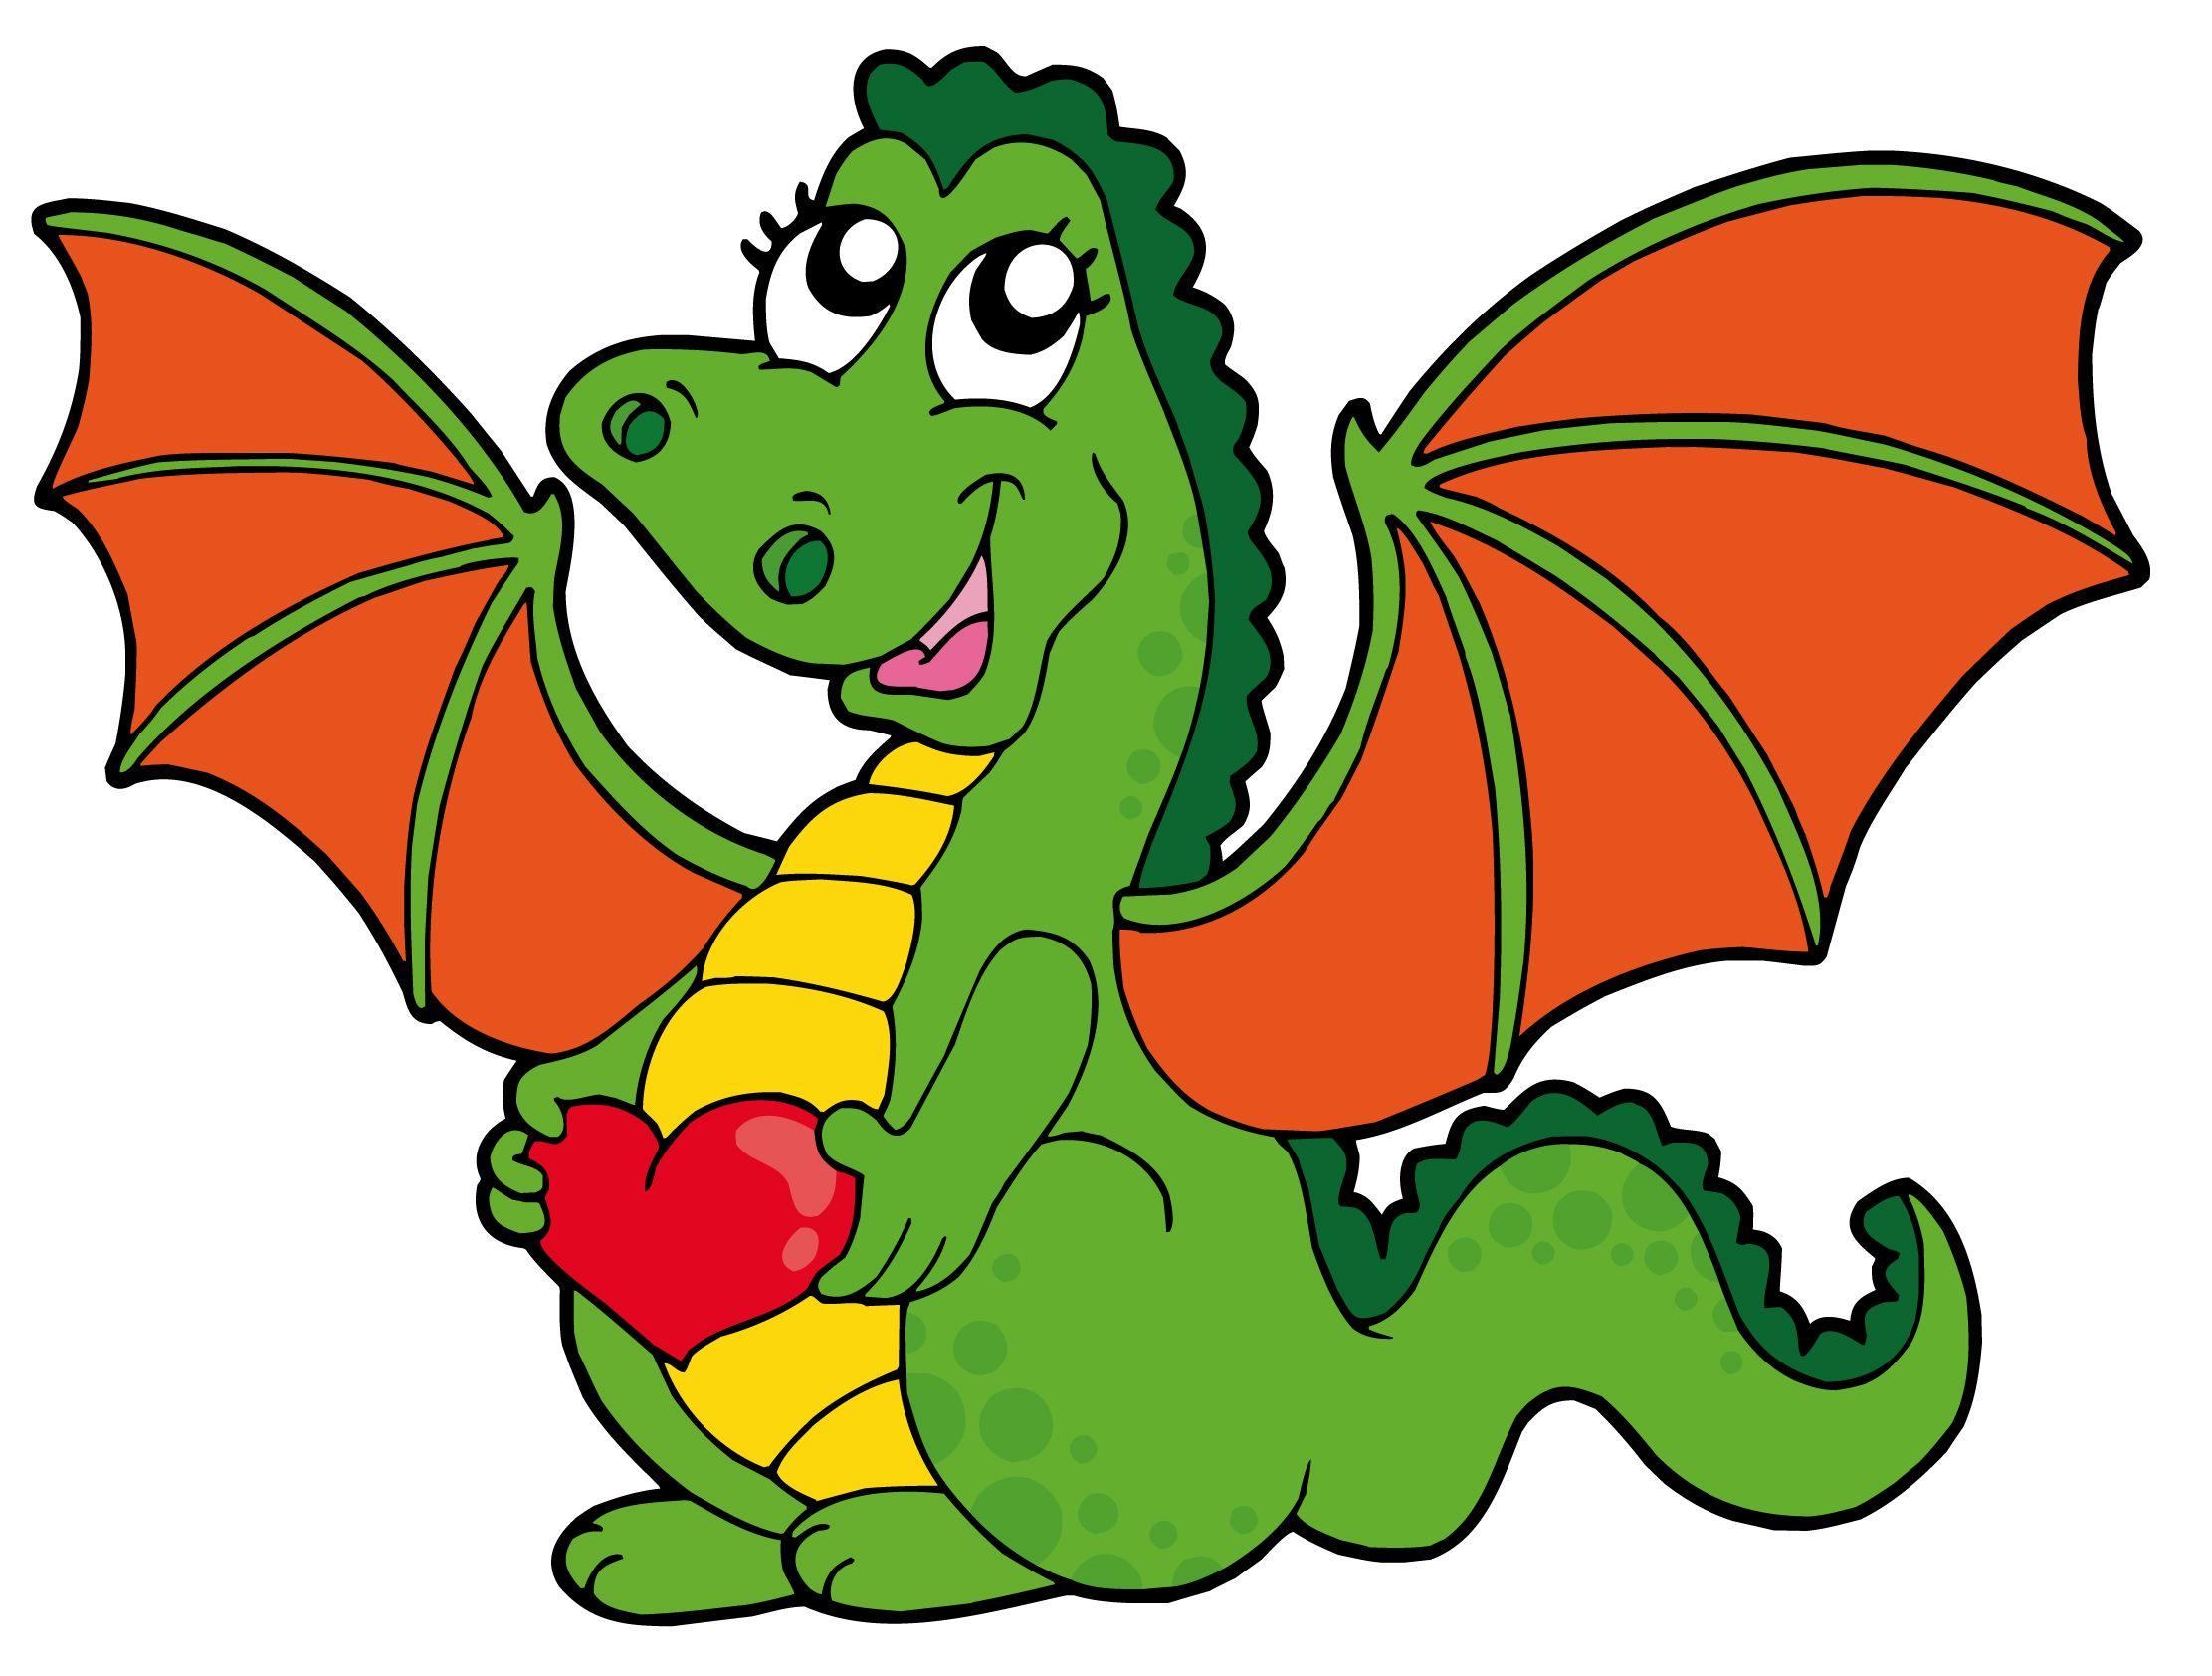 dragon clipart cartoon - Cerca amb Google | Drakar | Pinterest ...